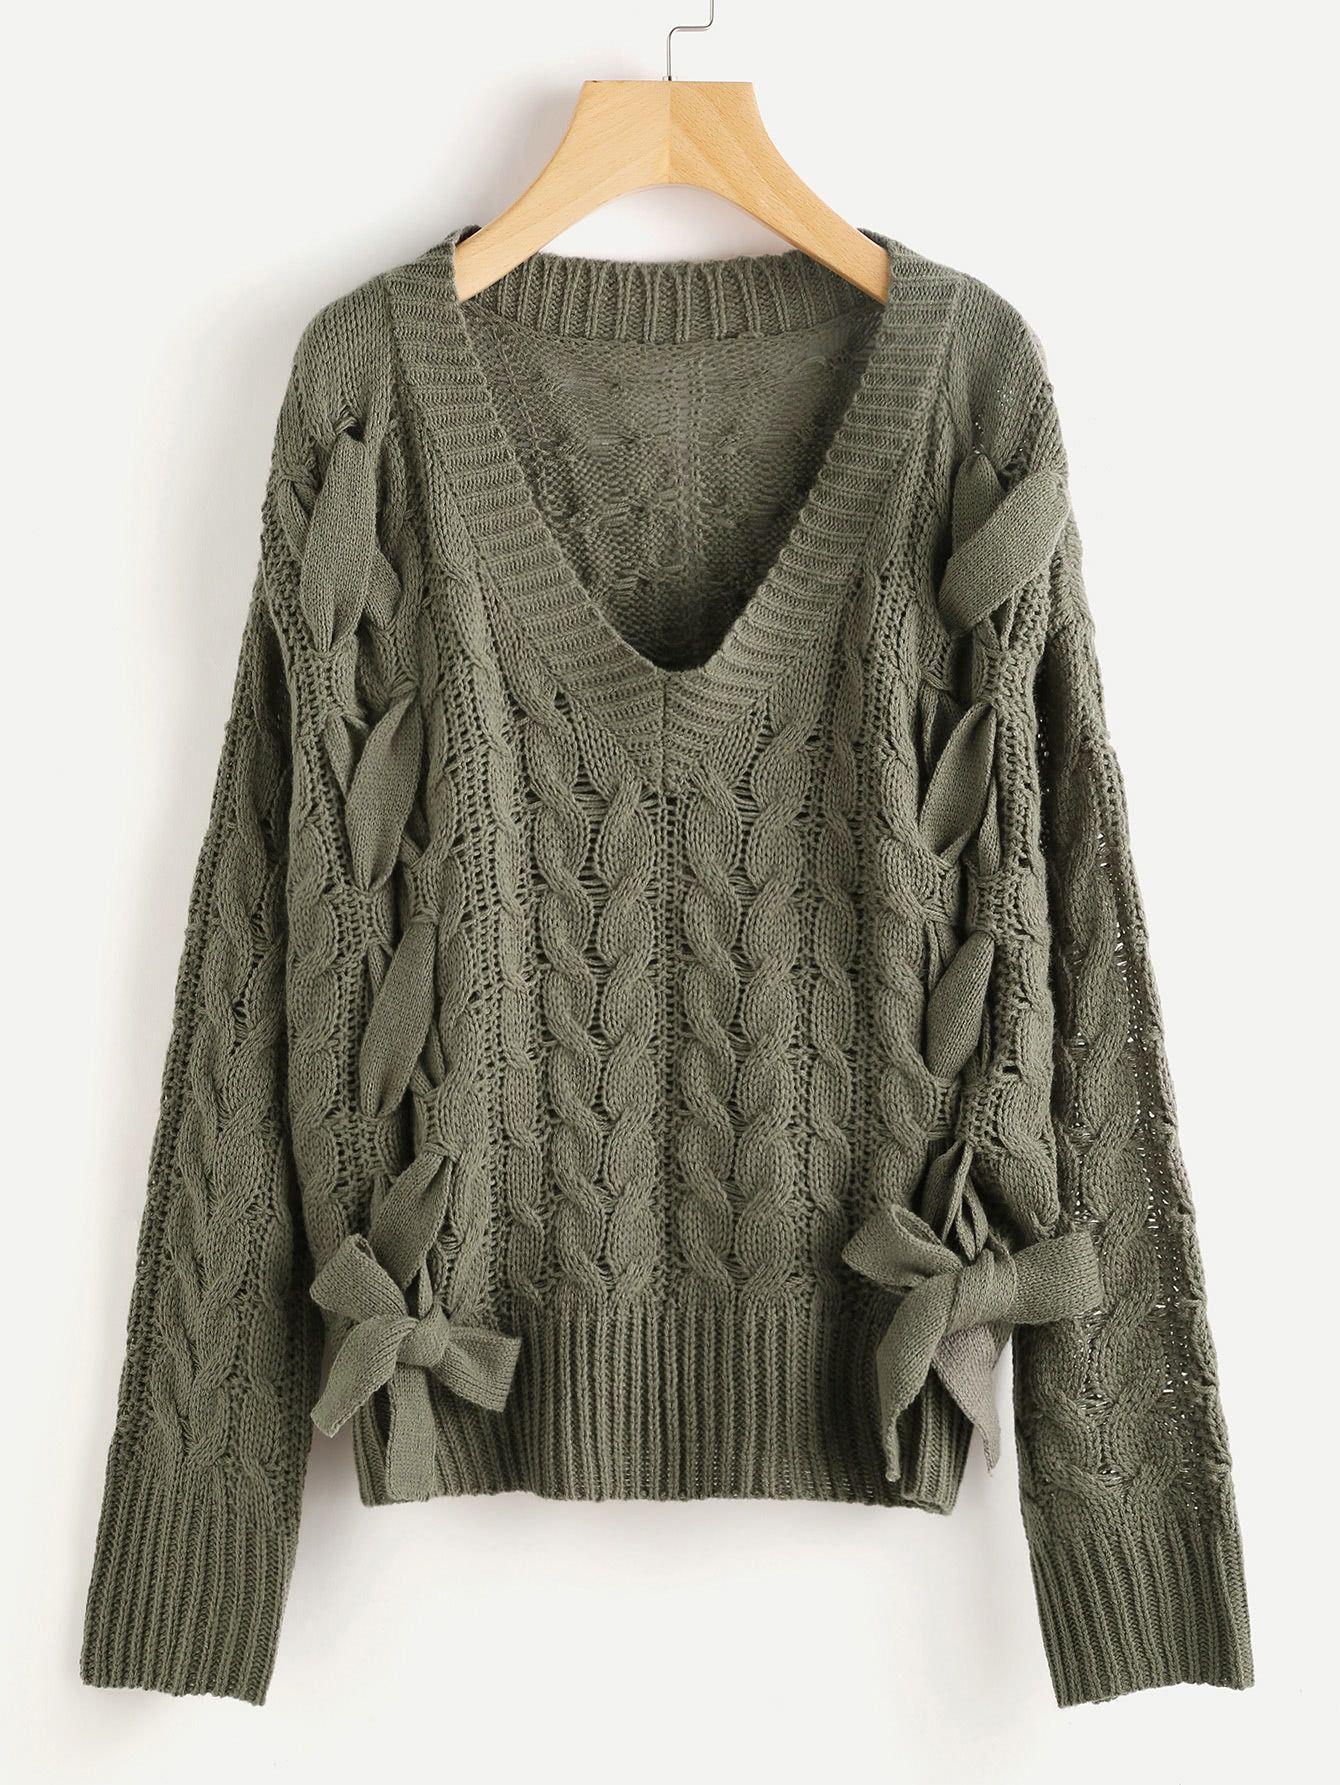 c196ce034 Shop Lace Up Cable Knit Jumper online. SheIn offers Lace Up Cable Knit  Jumper   more to fit your fashionable needs.